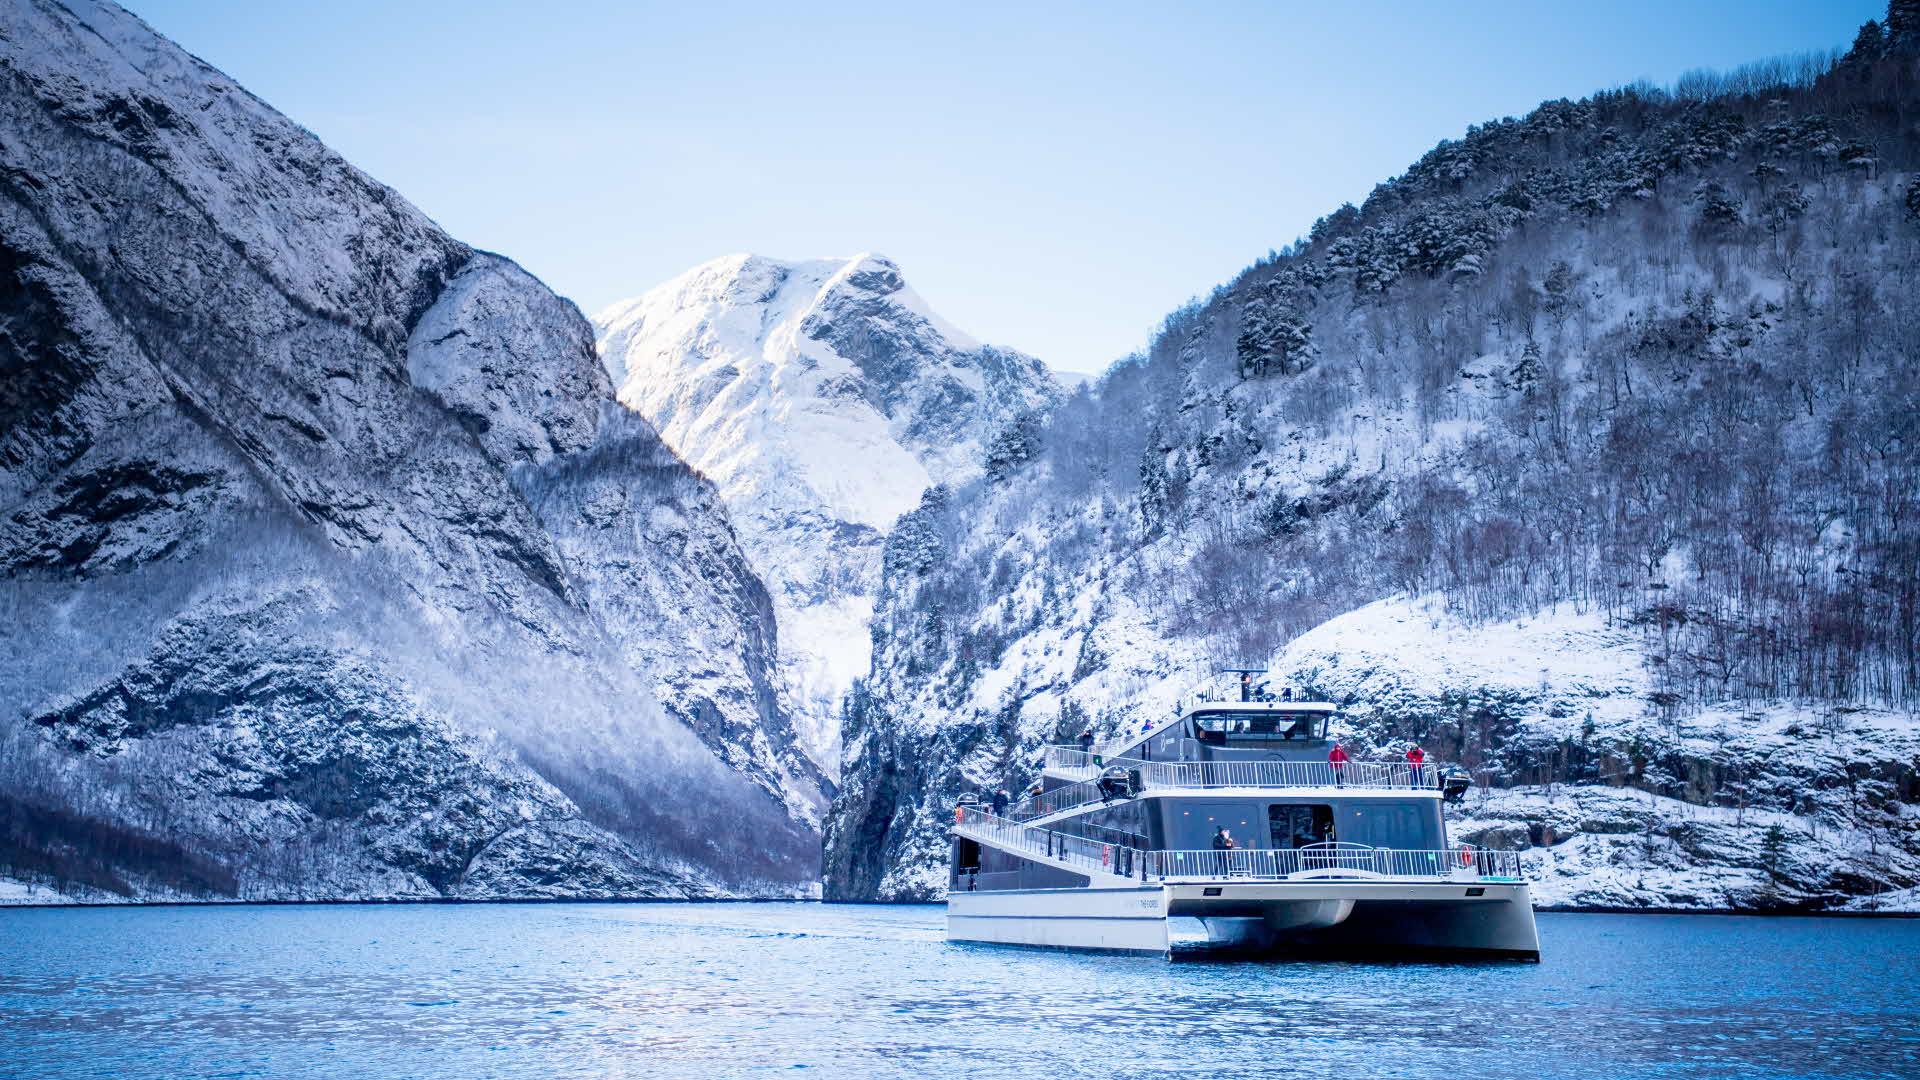 Elbåten Future of The Fjords foran snødekte fjell i Nærøyfjorden